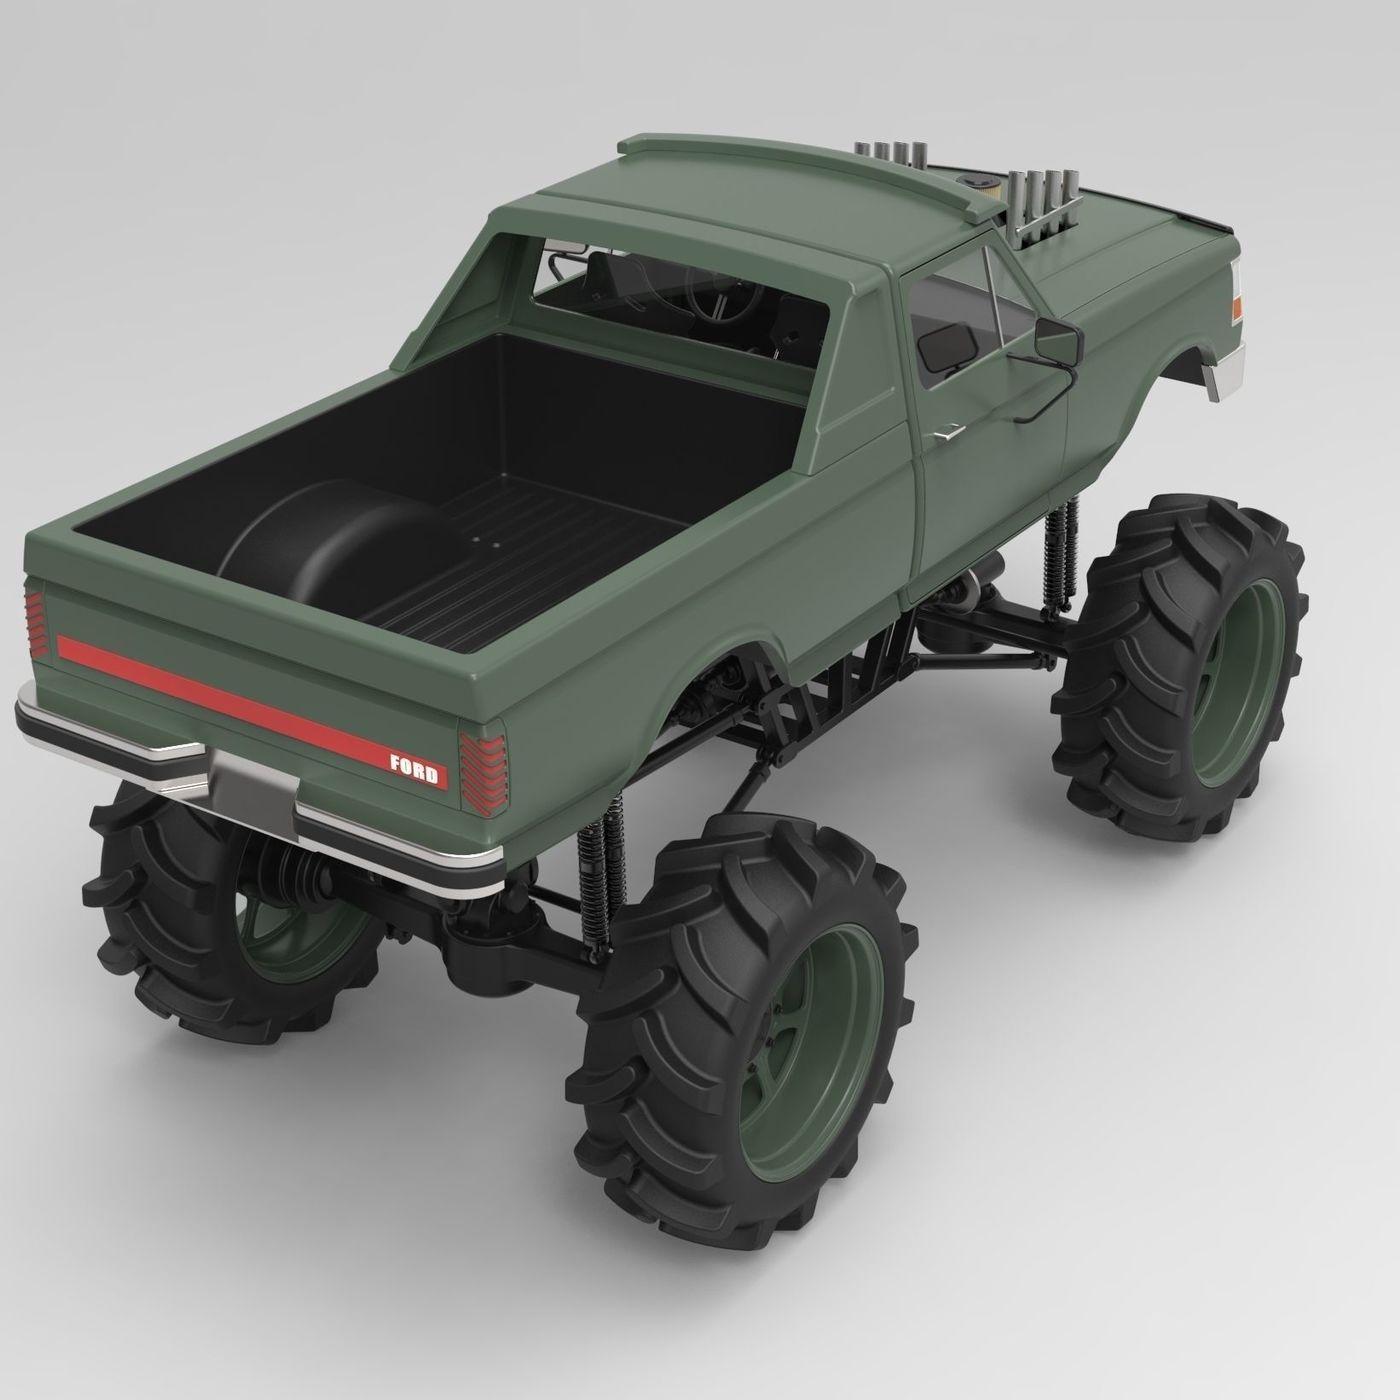 Mud truck